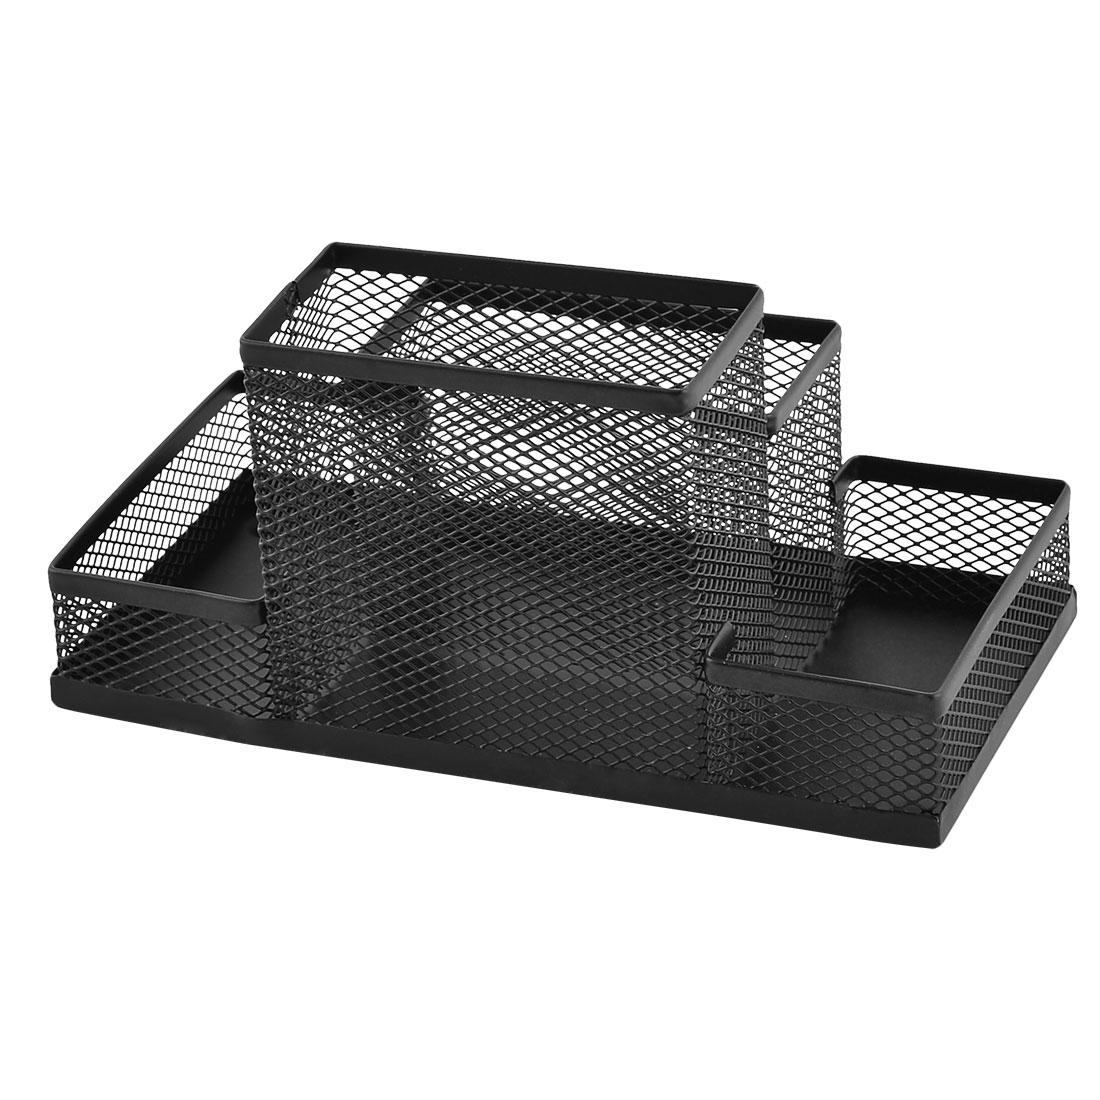 Metal Mesh 4 Compartments Desk Supplies Pen Storage Box Holder Organizer Black - image 2 of 4